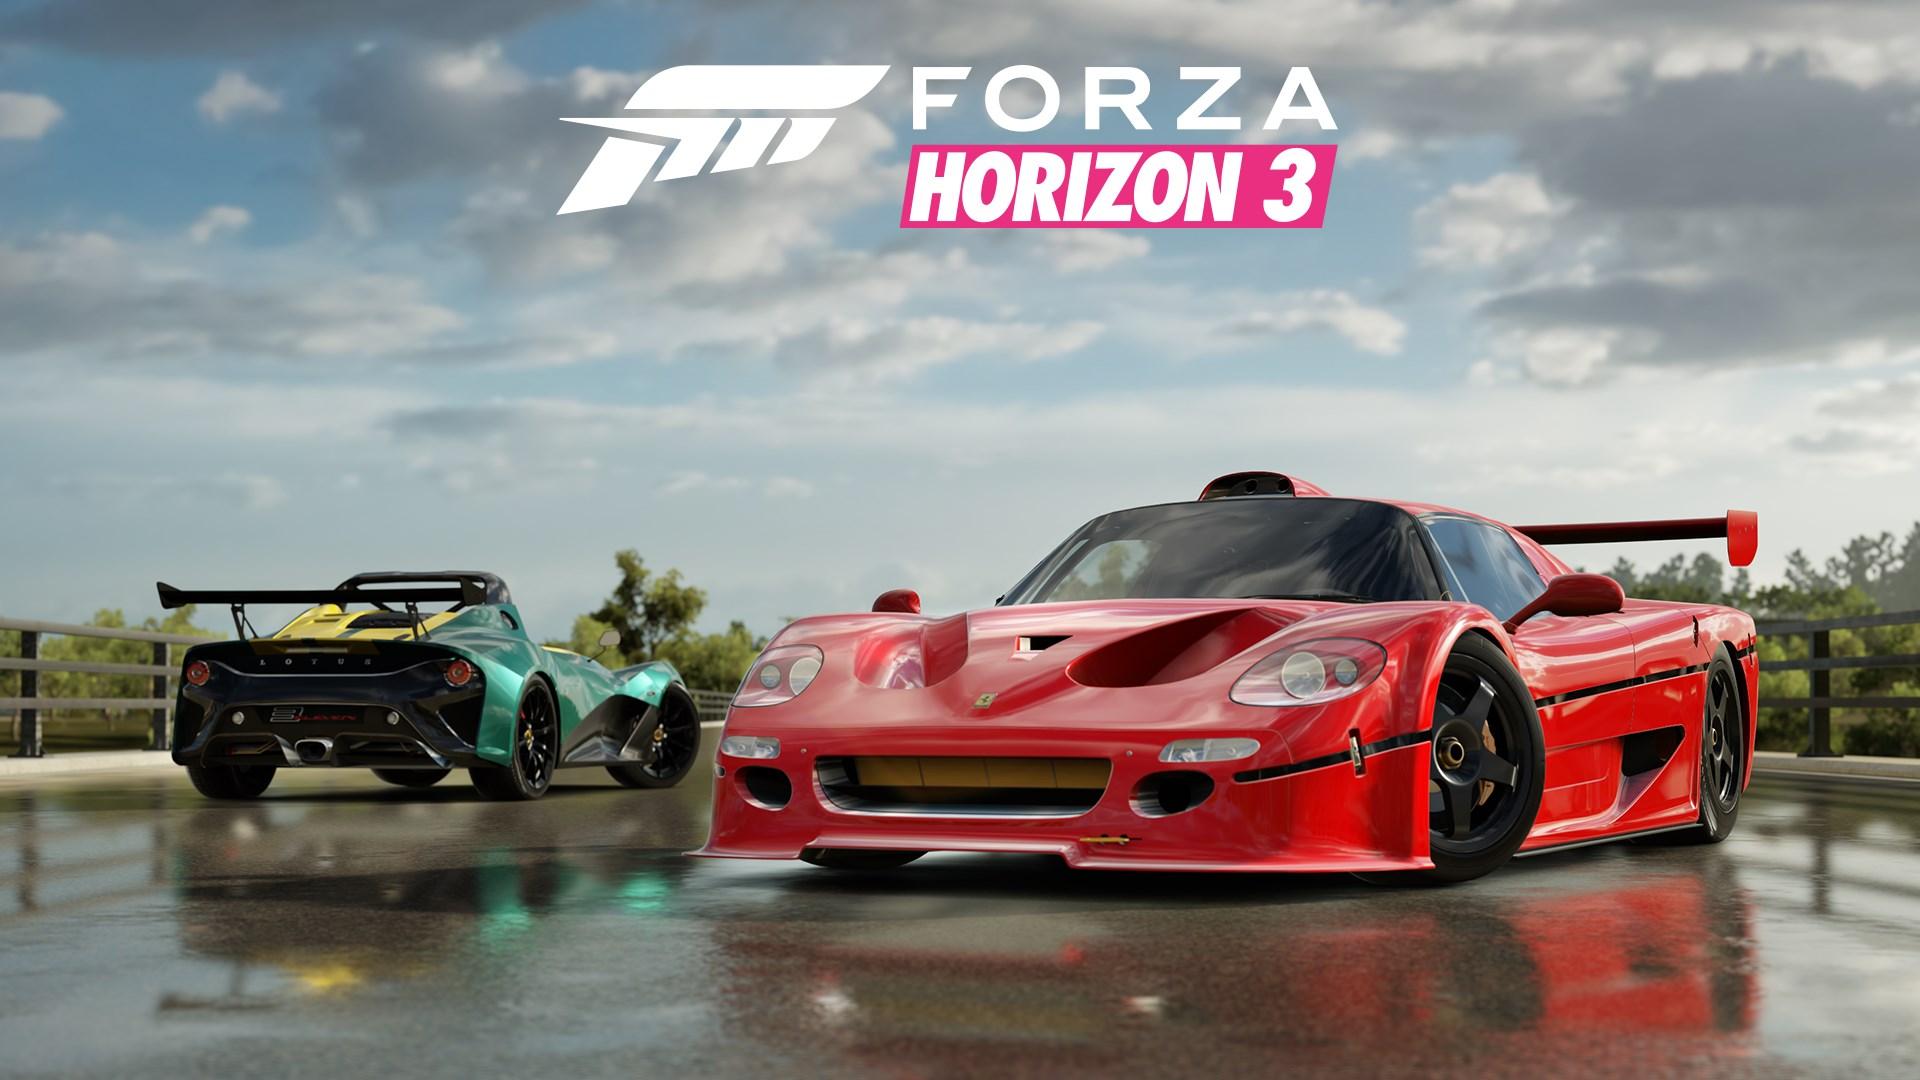 Pack de voitures Mountain Dew Forza Horizon 3